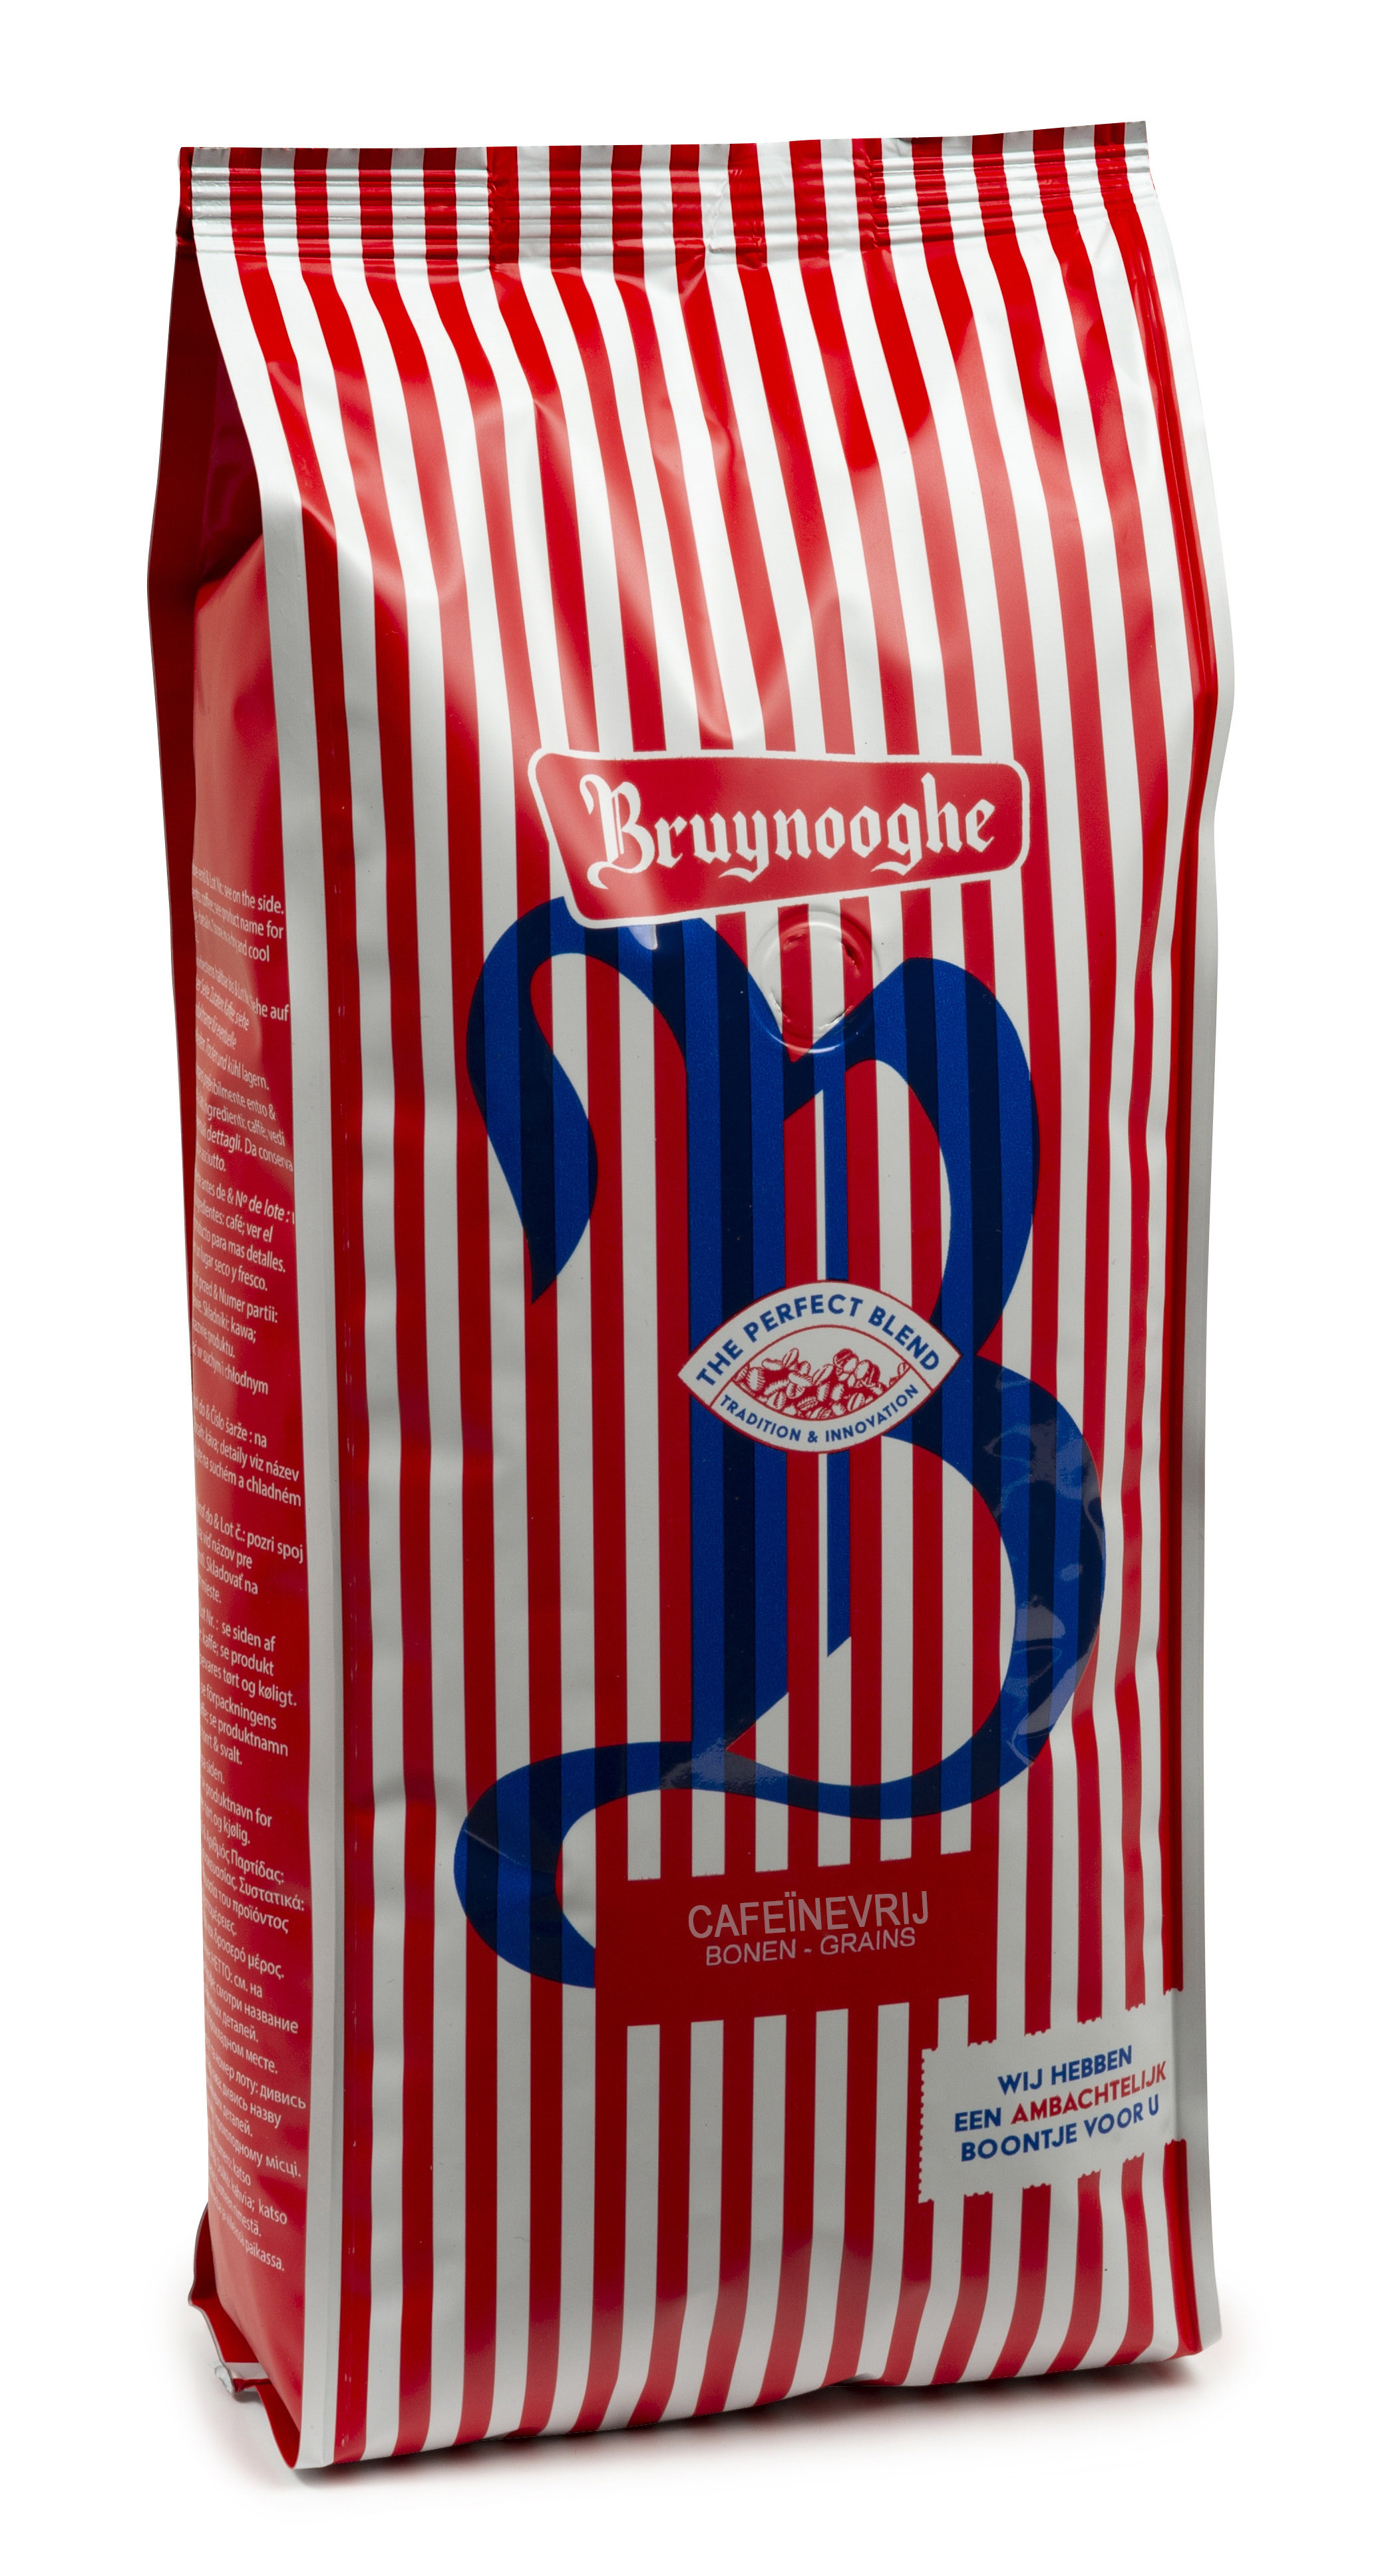 Café Bruynooghe Décaféine grains 1kg (Koffie)